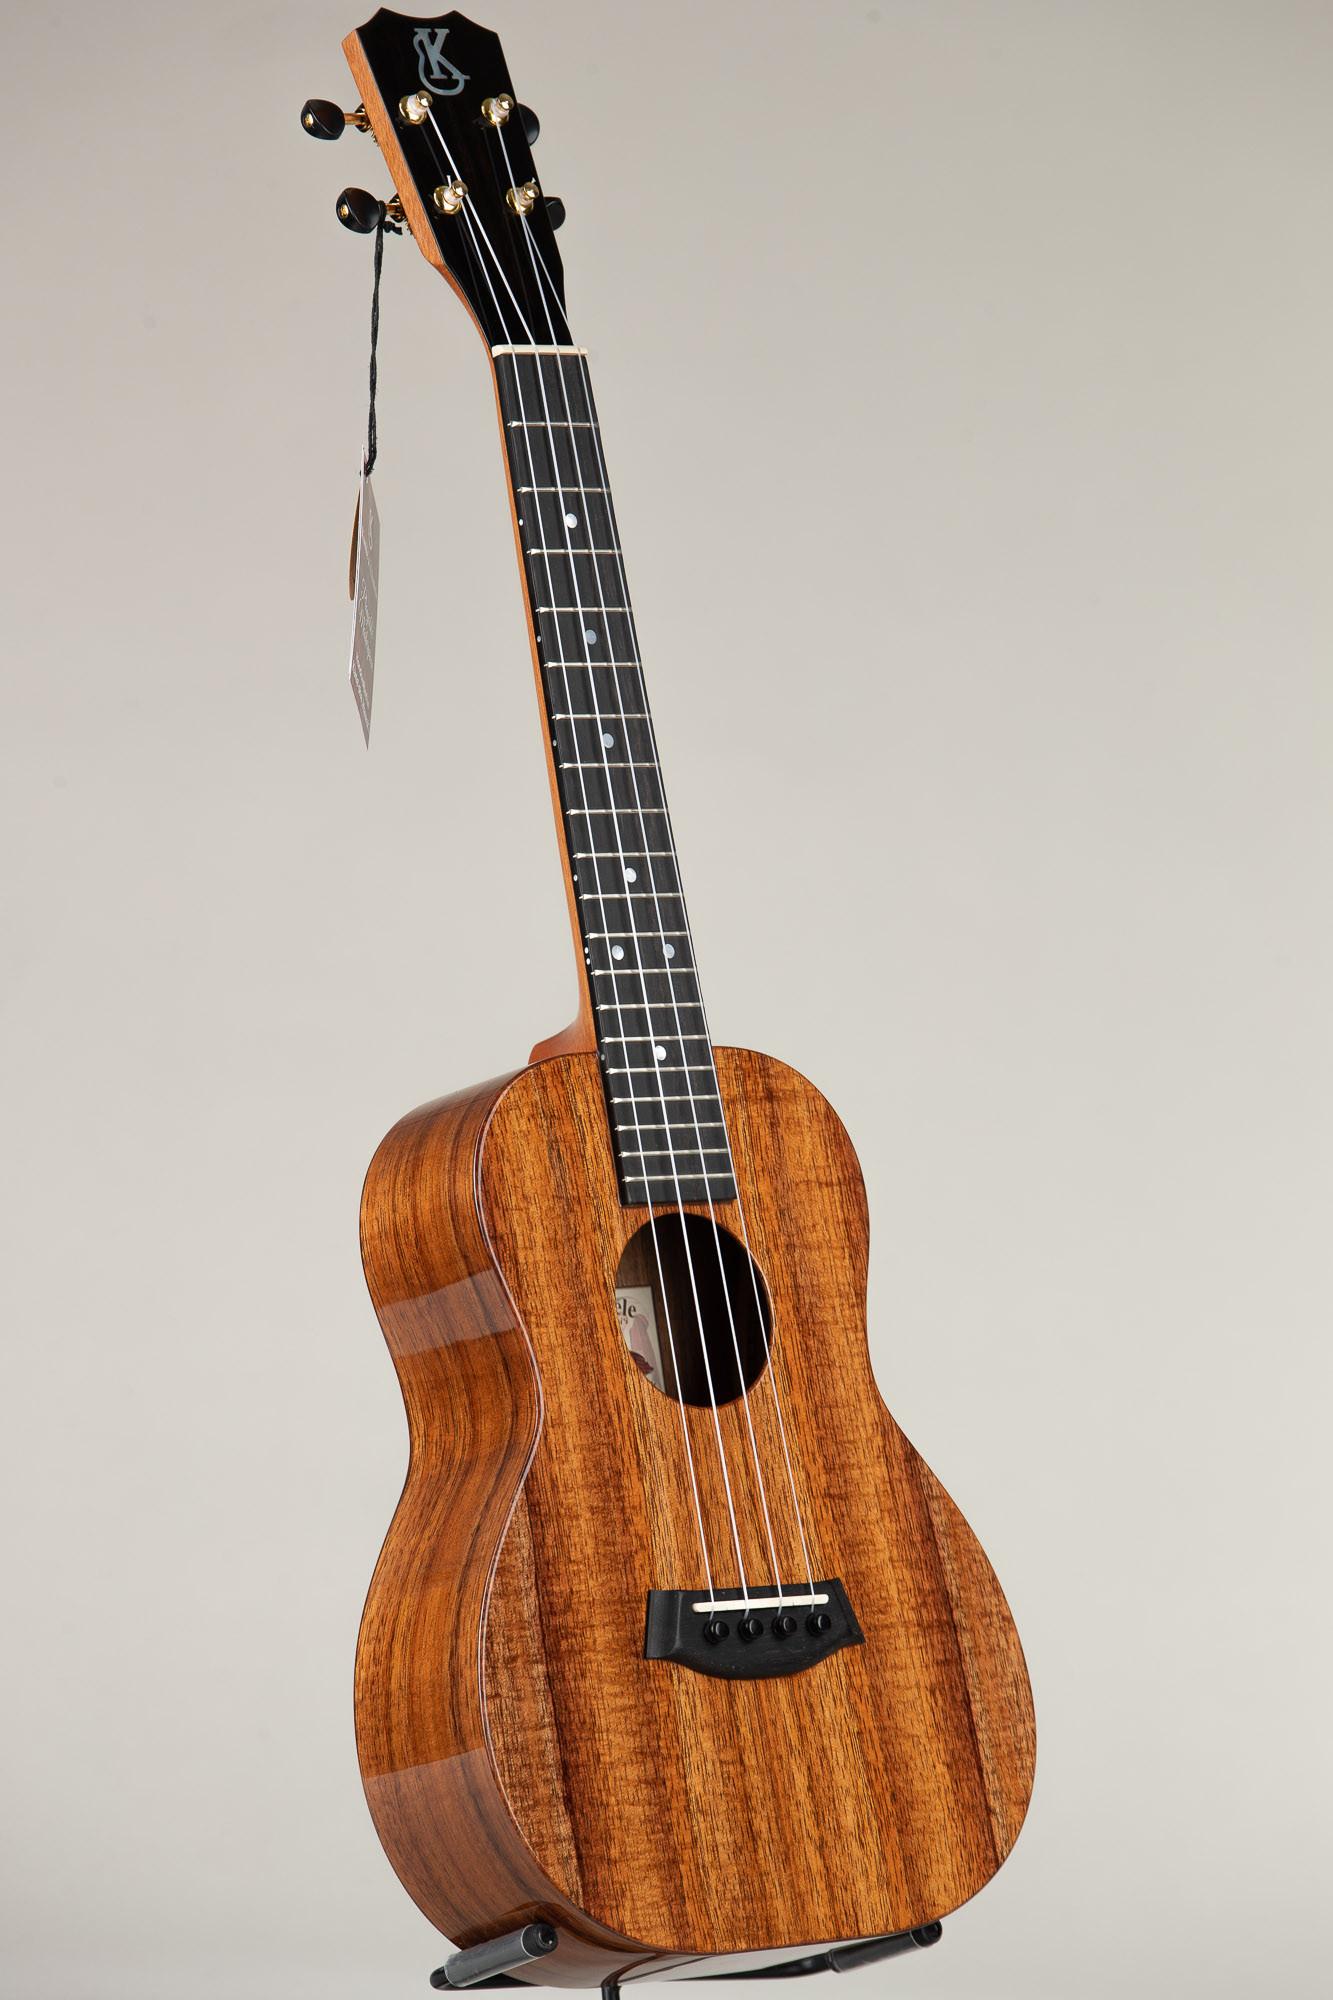 Kanile'a Koa Gloss Tenor (K-1 T 24567)